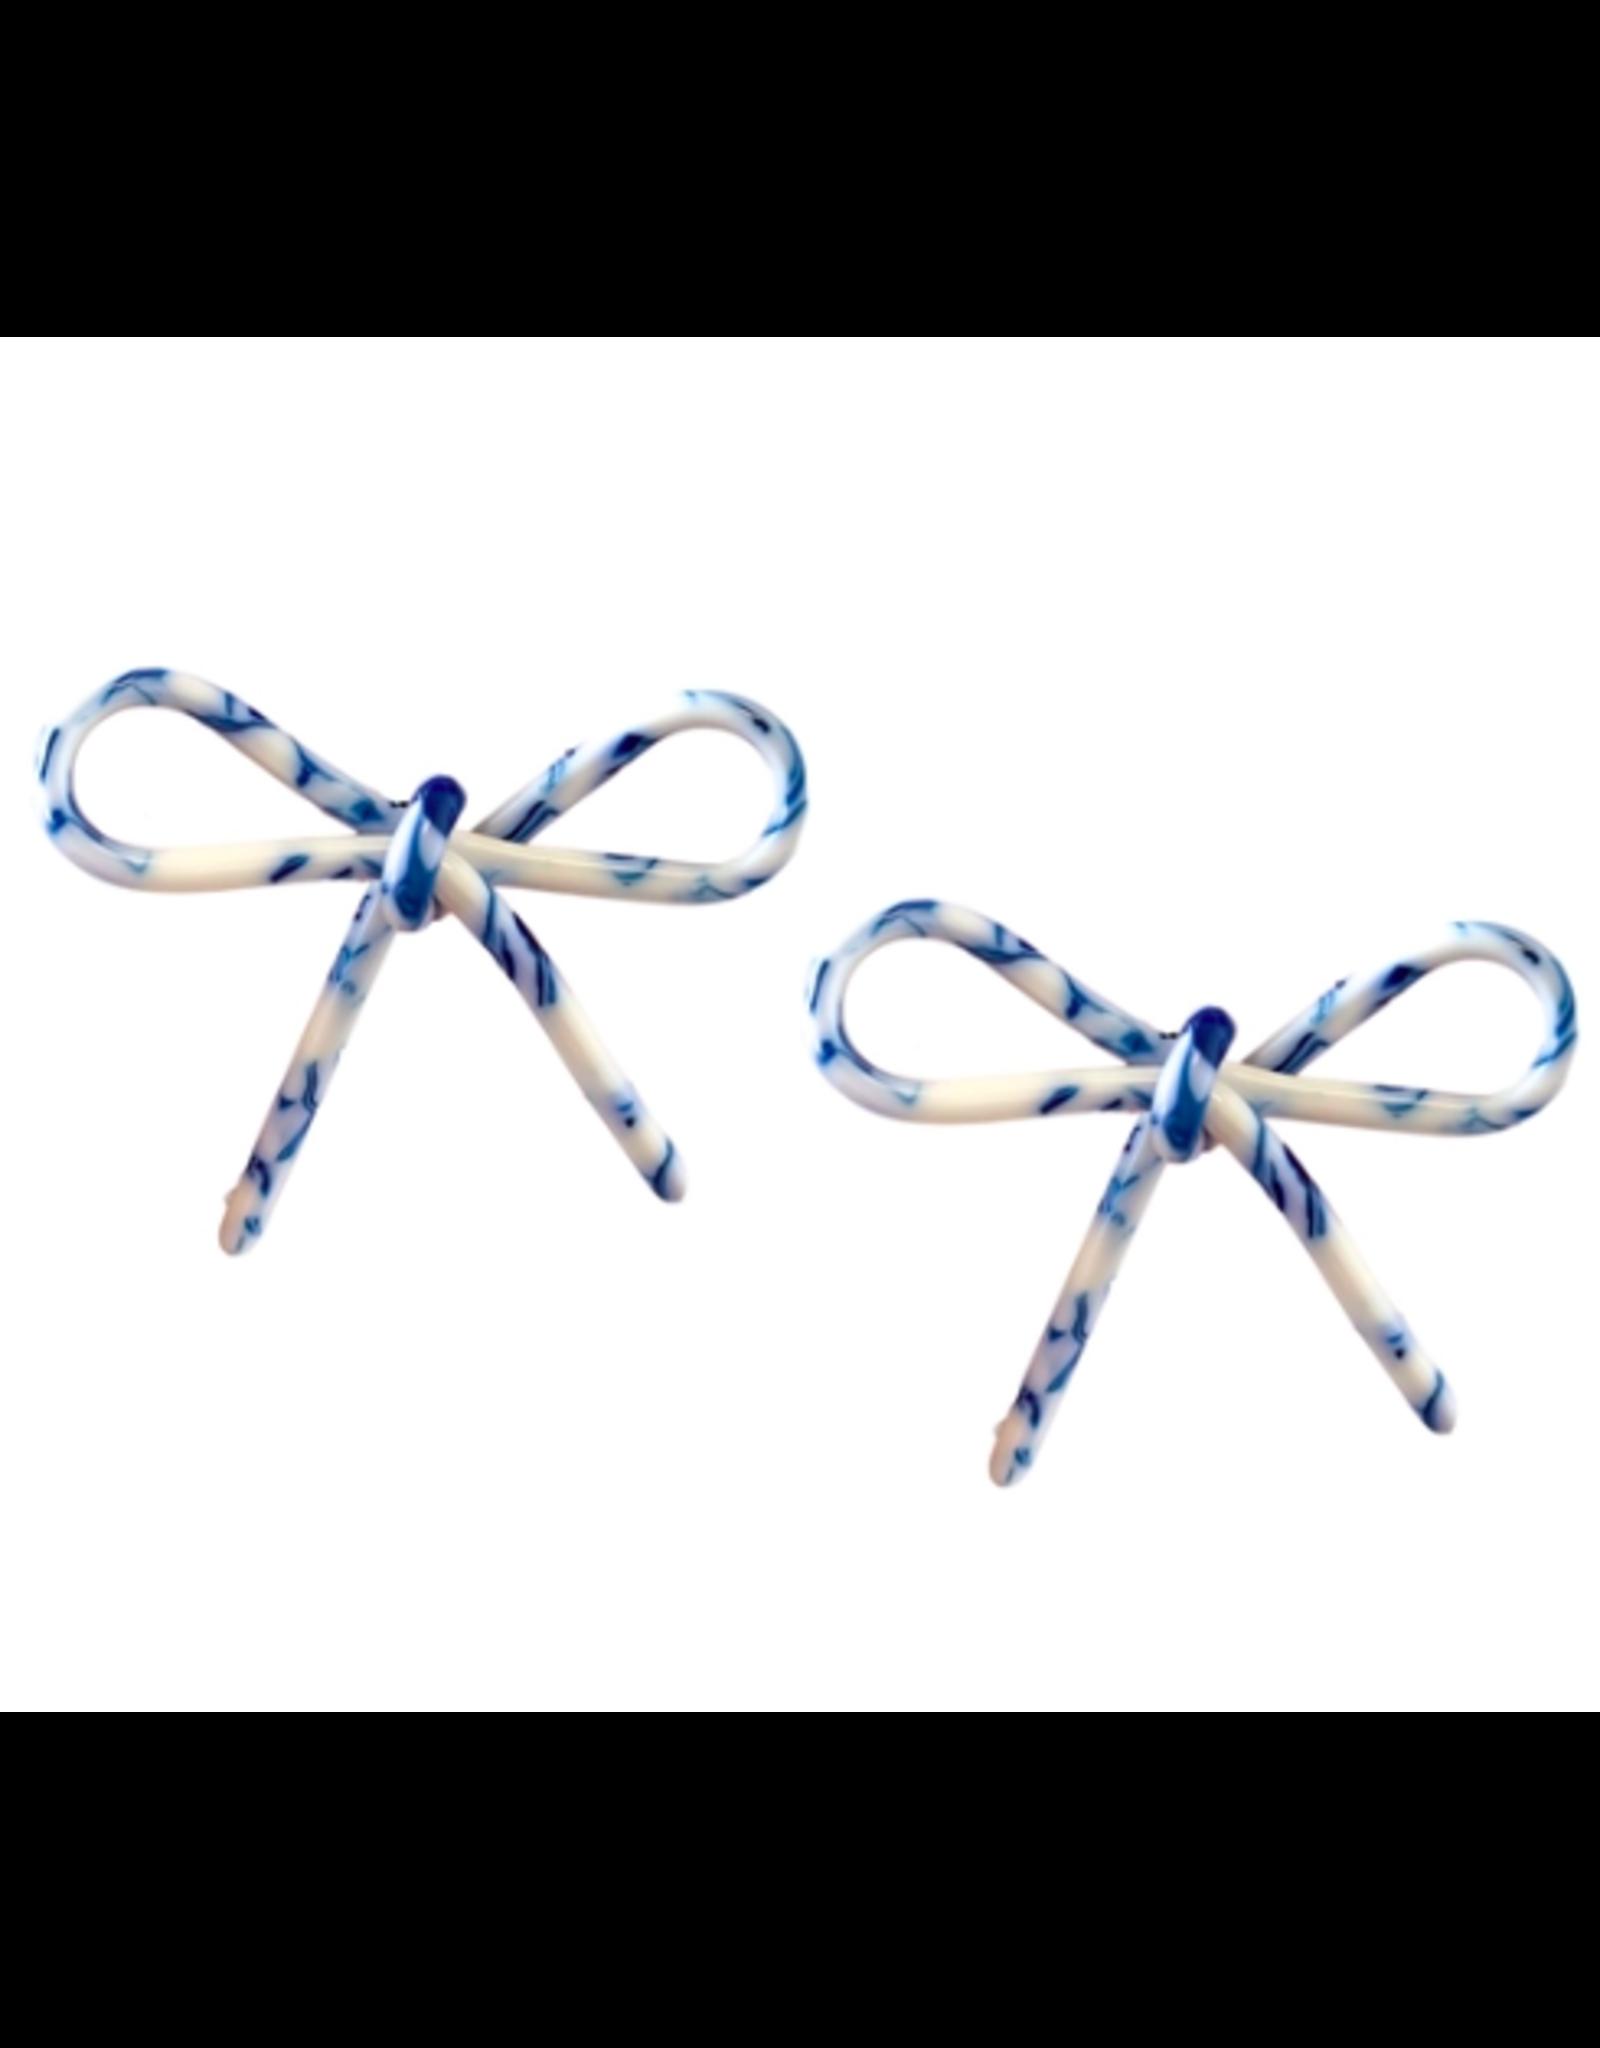 Tortoise Bows in Blue & White Earrings